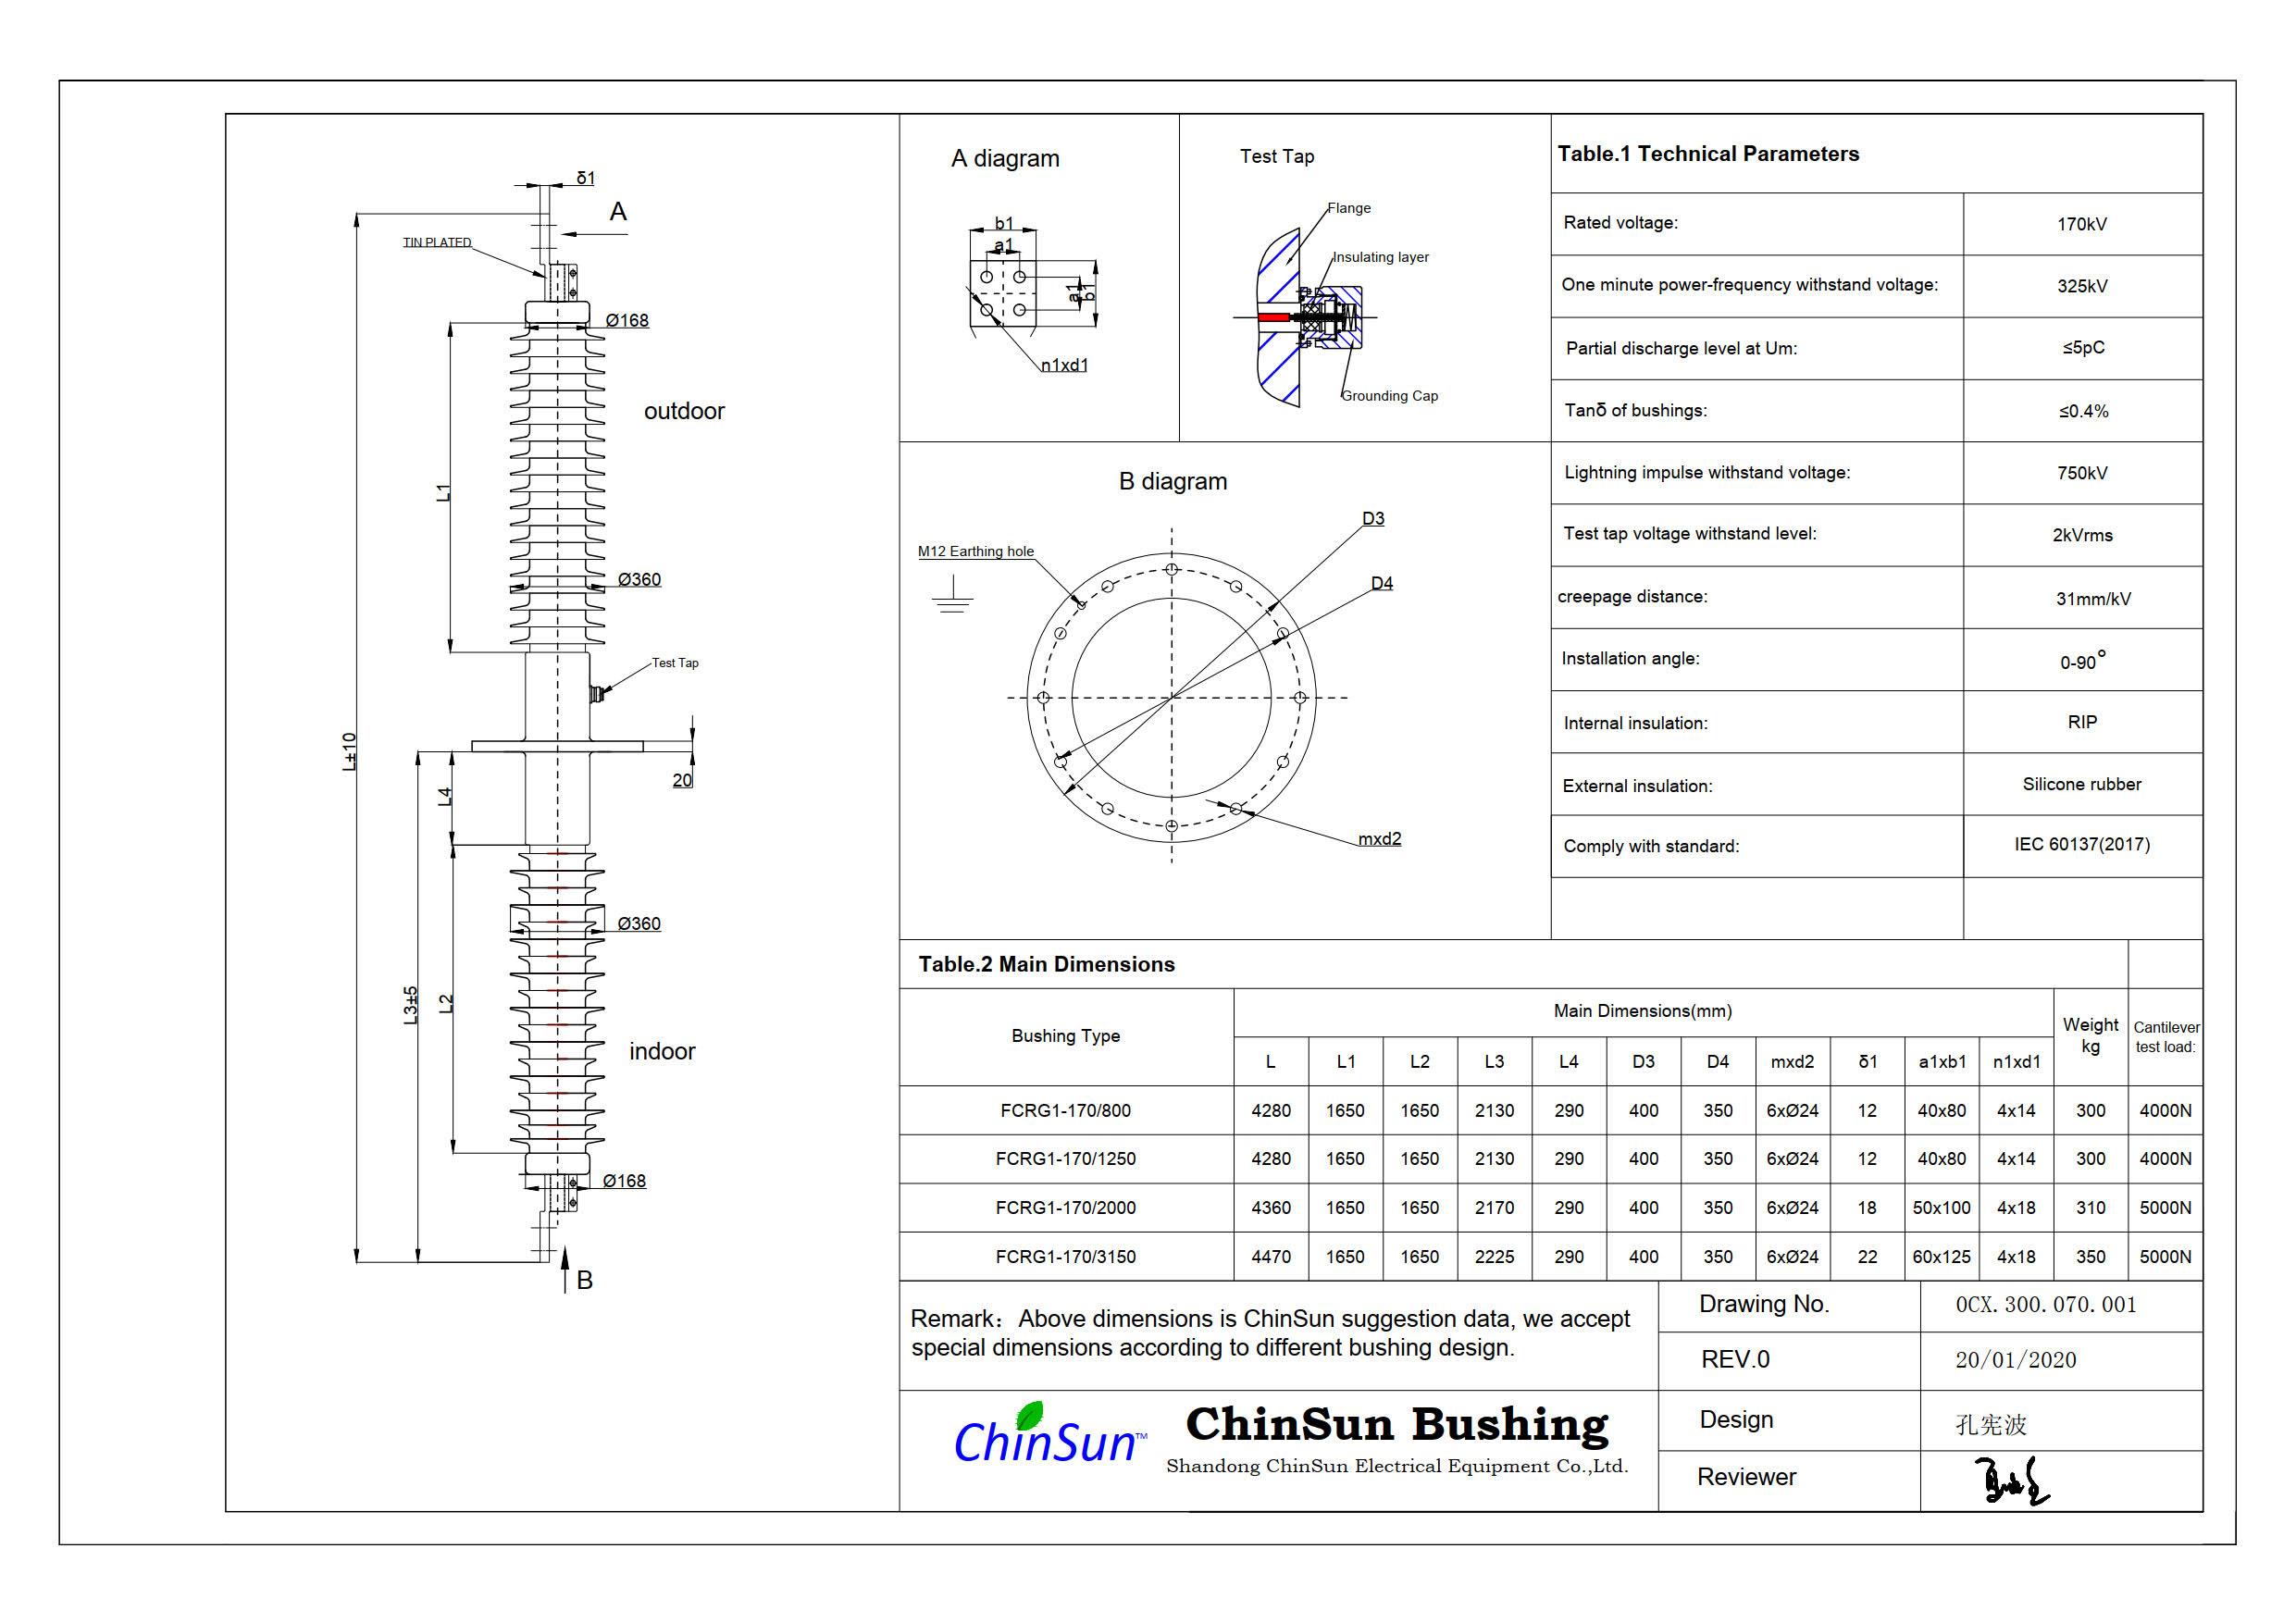 Drawing-wall bushing-170kV silicone rubber-ChinSun